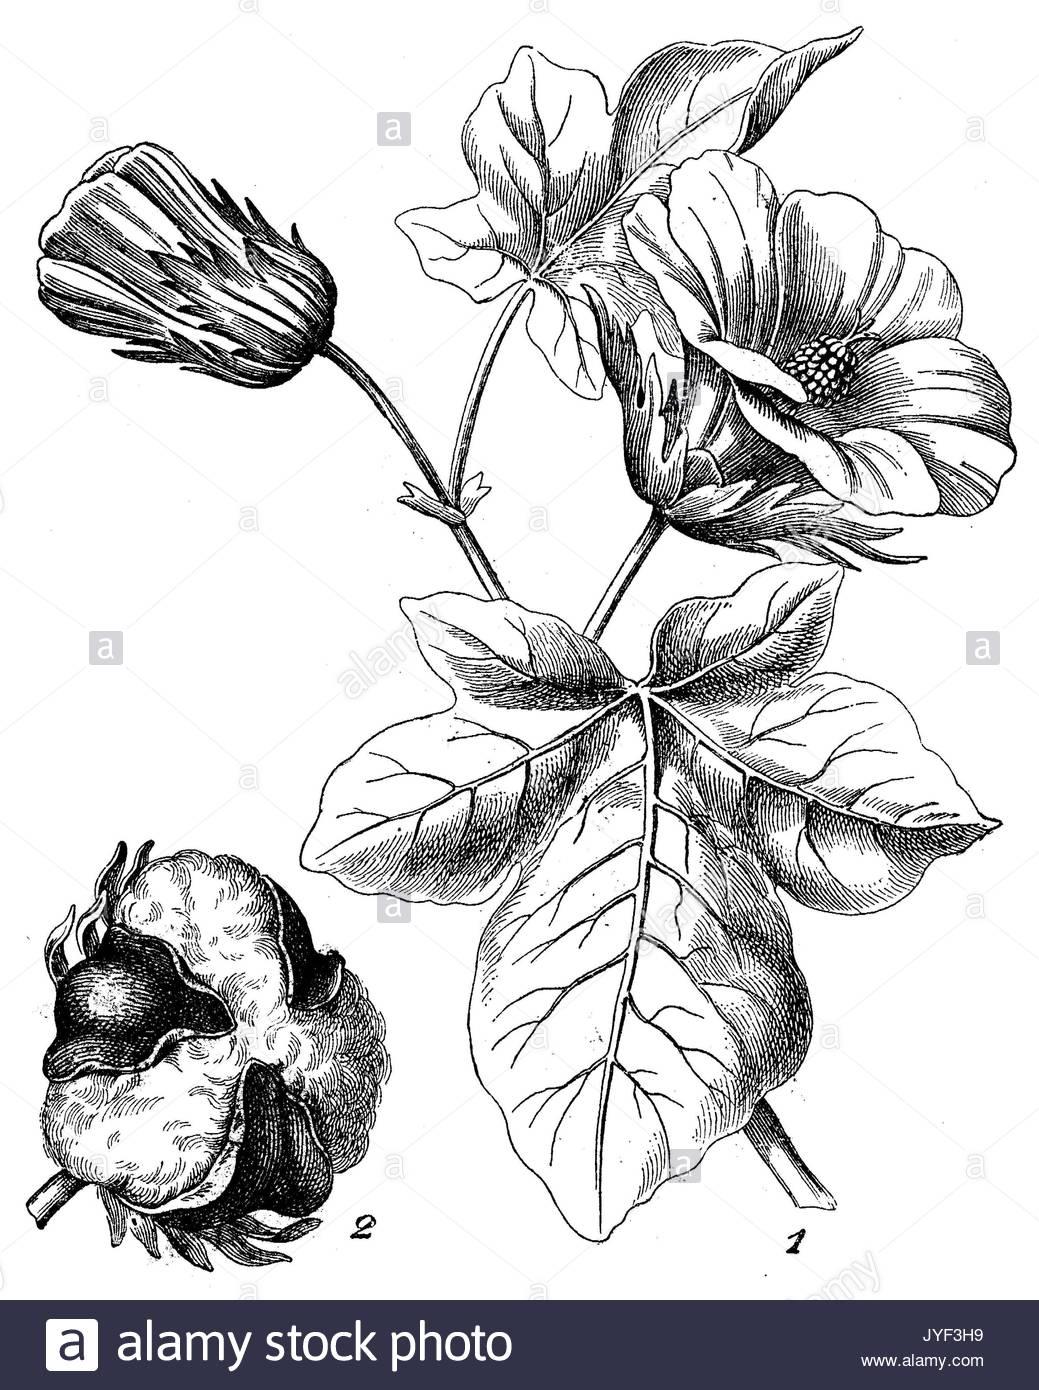 1039x1390 Cotton Plant Botanical Drawing Stock Photos Amp Cotton Plant